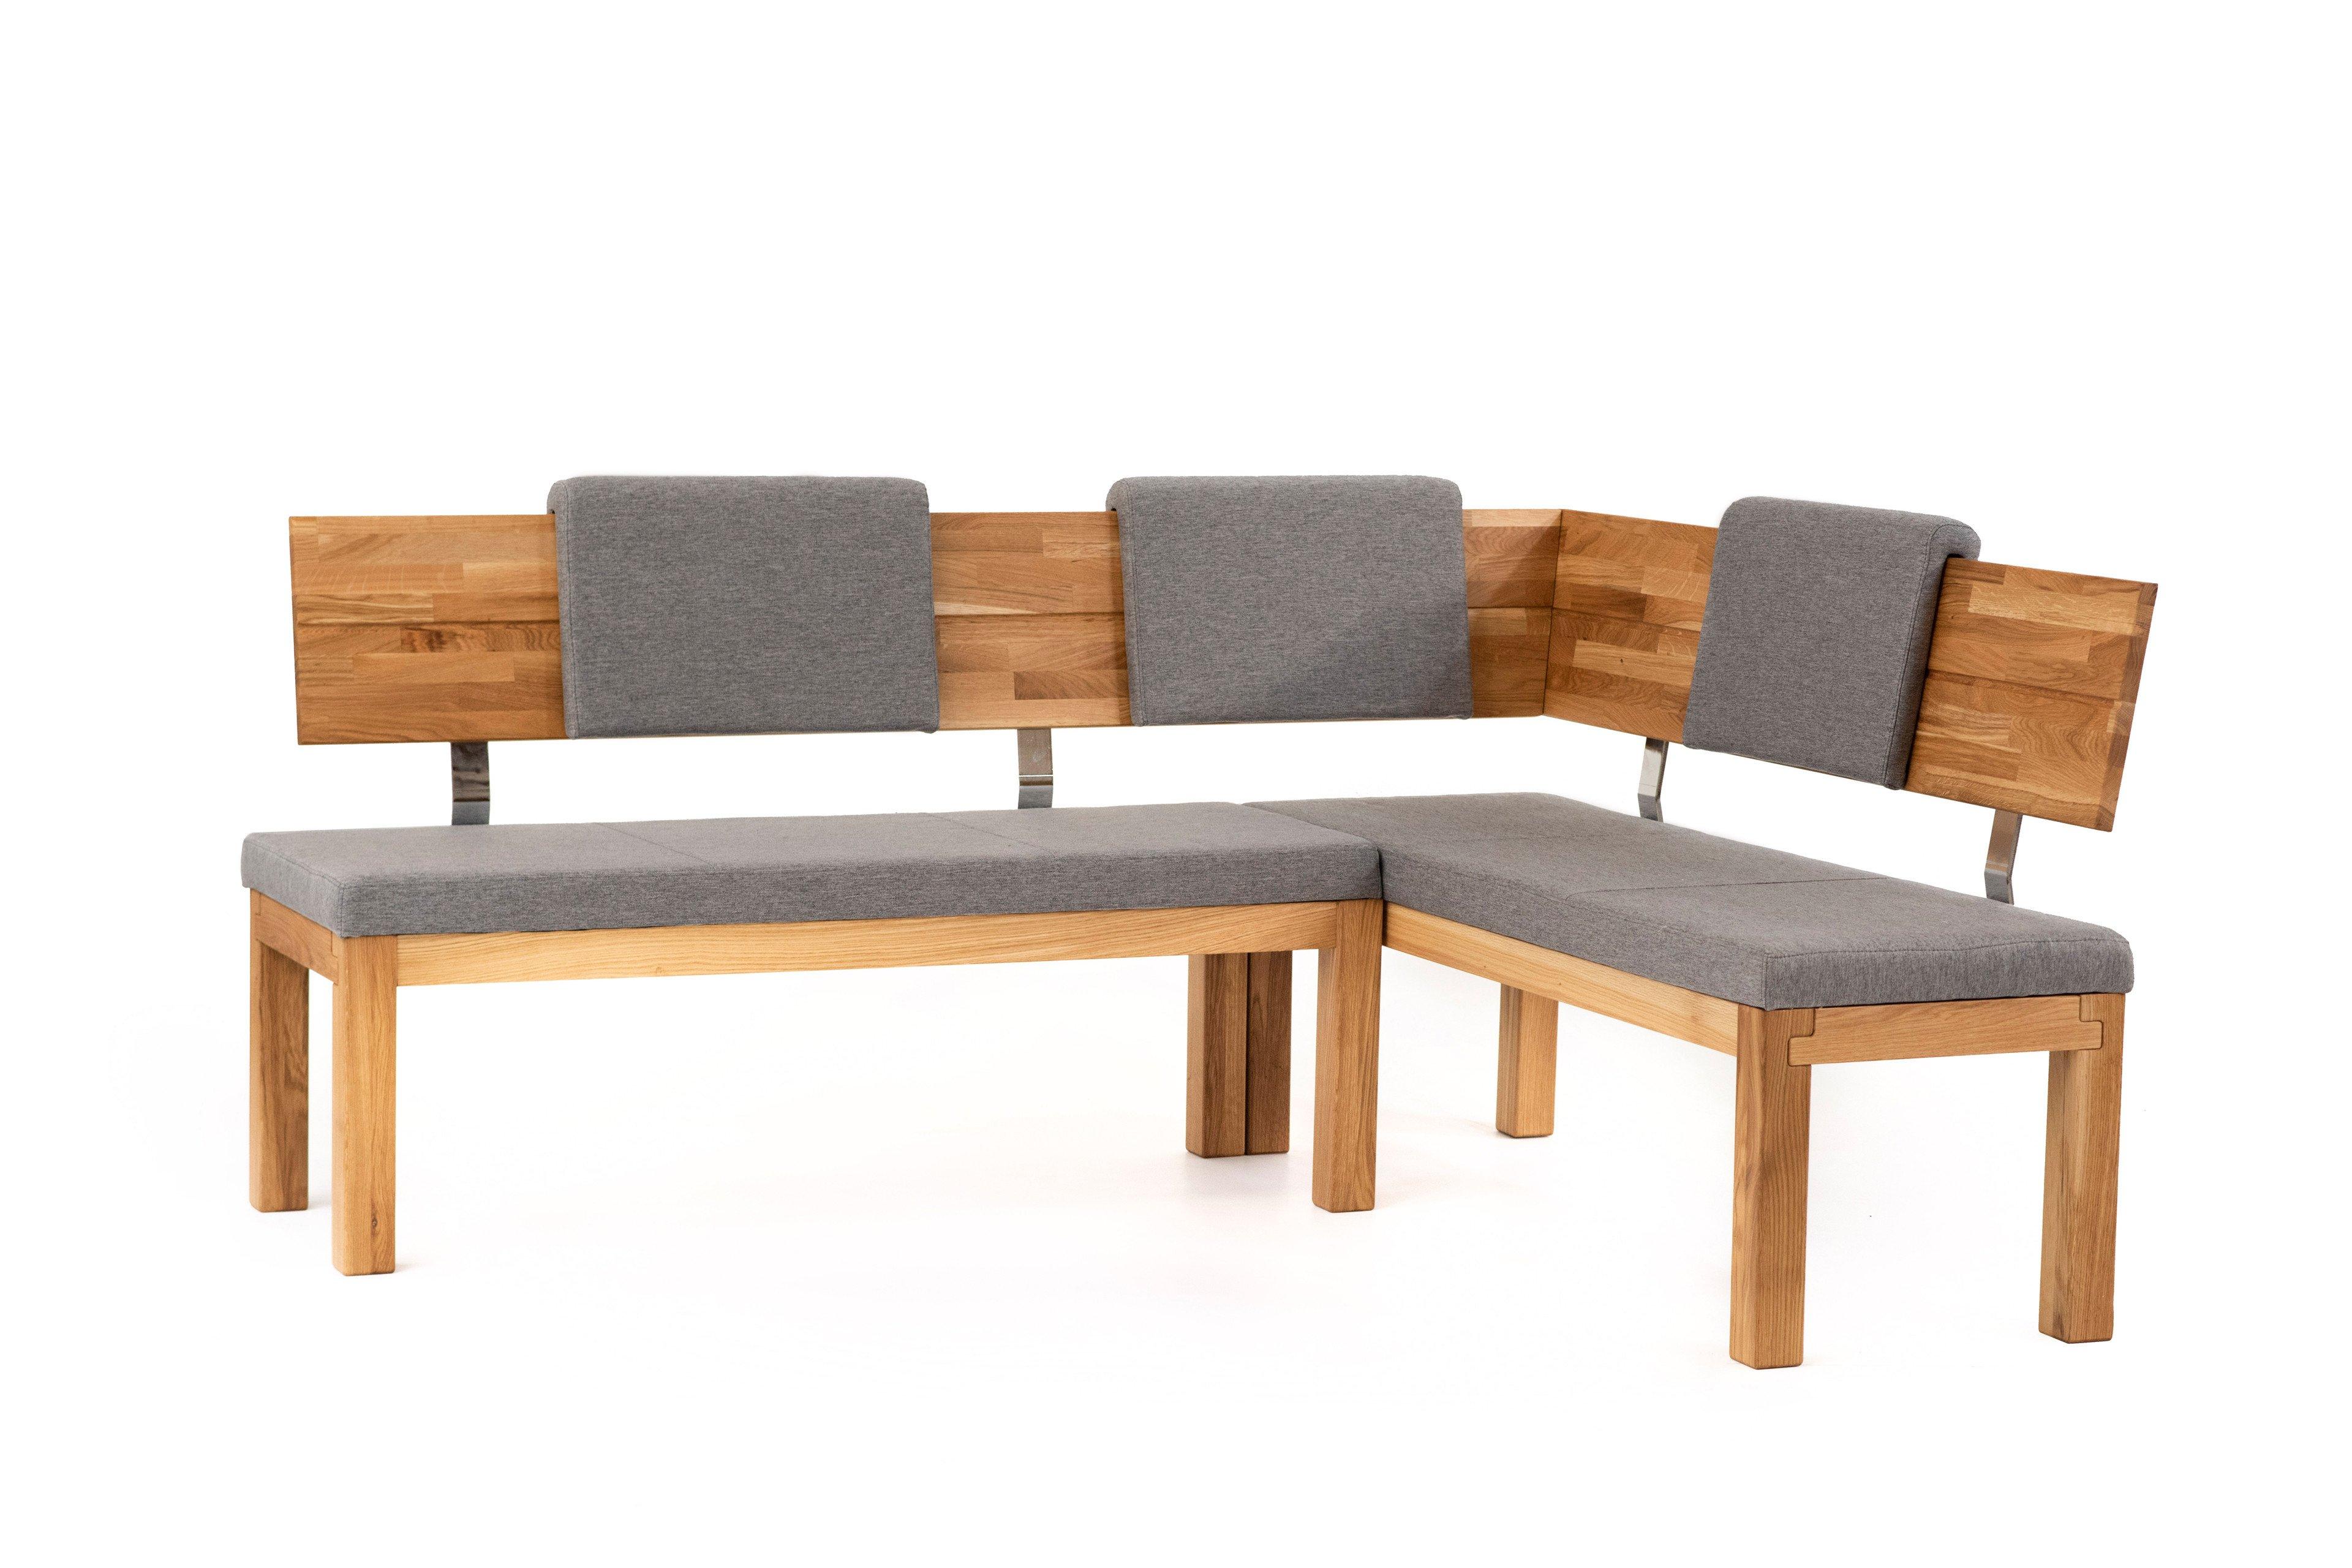 Standard Furniture Eckbank Catania In Kernbuche Dunkelbraun Mobel